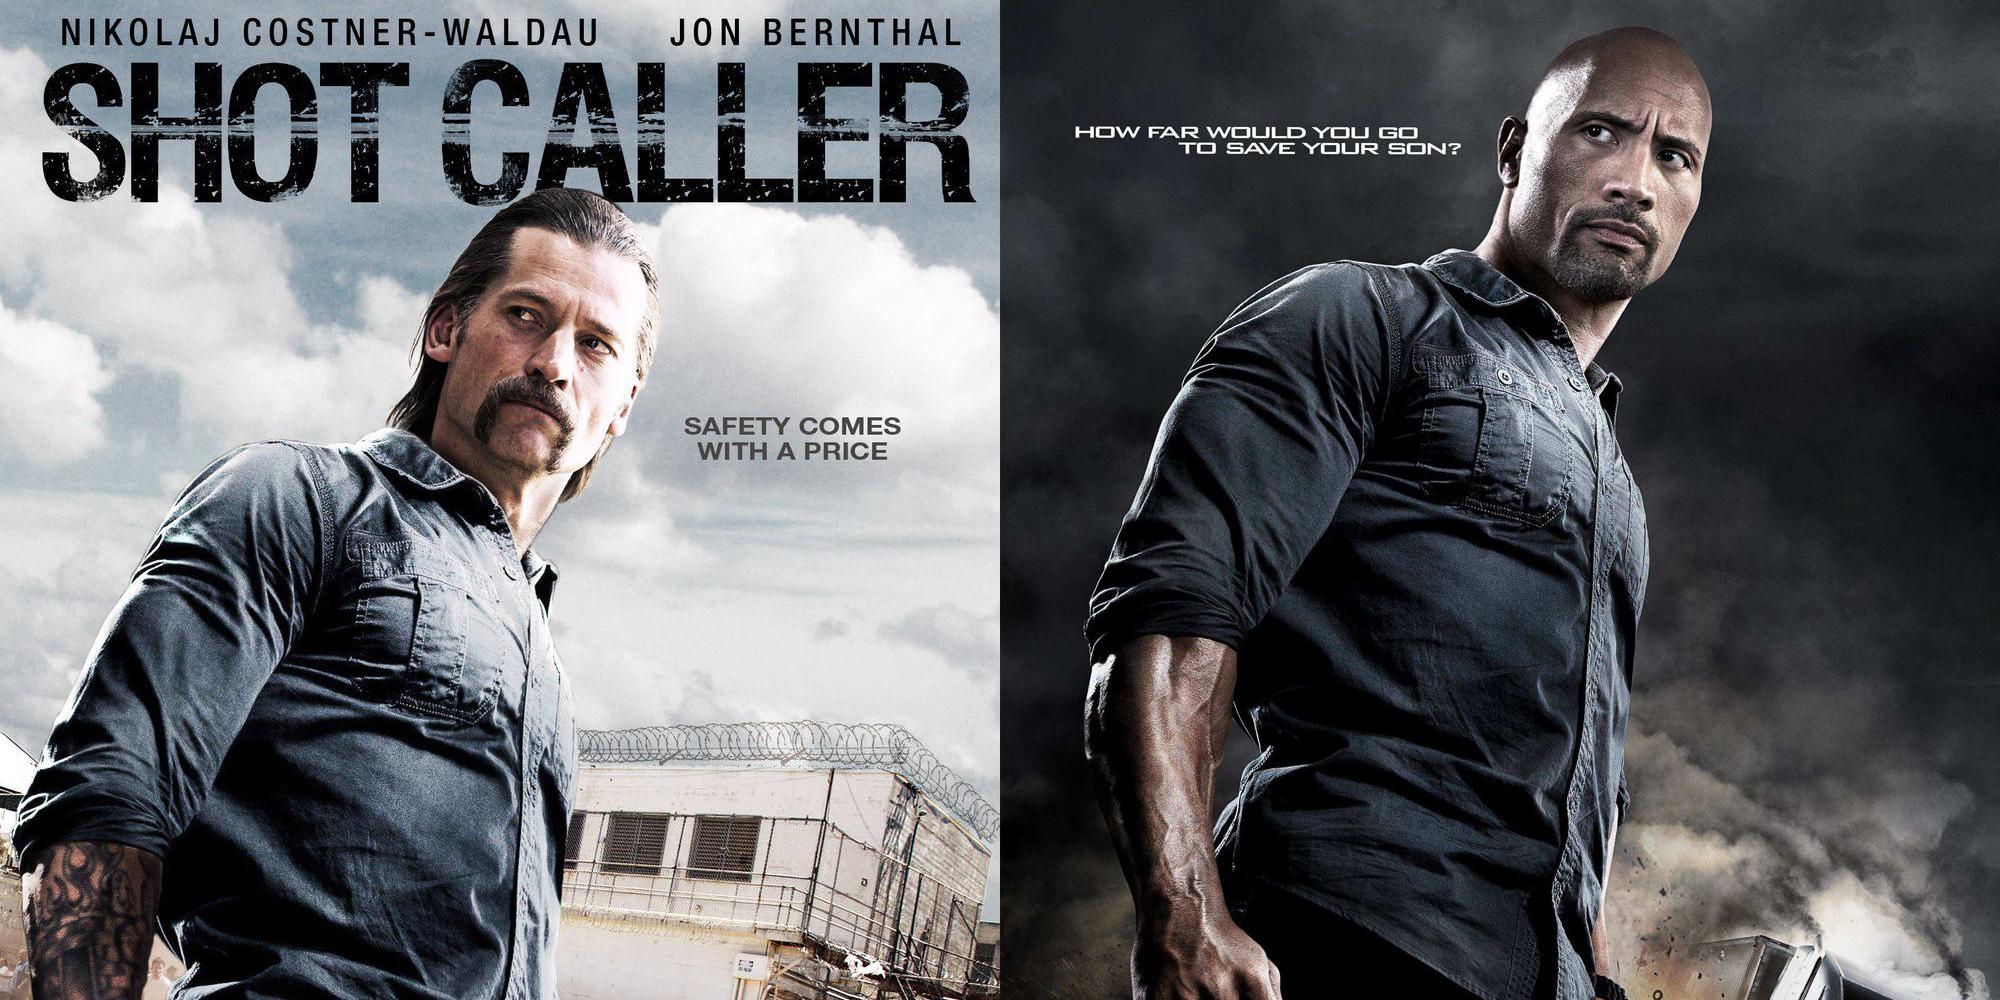 Movie Poster Reuses Dwayne Johnson's Body